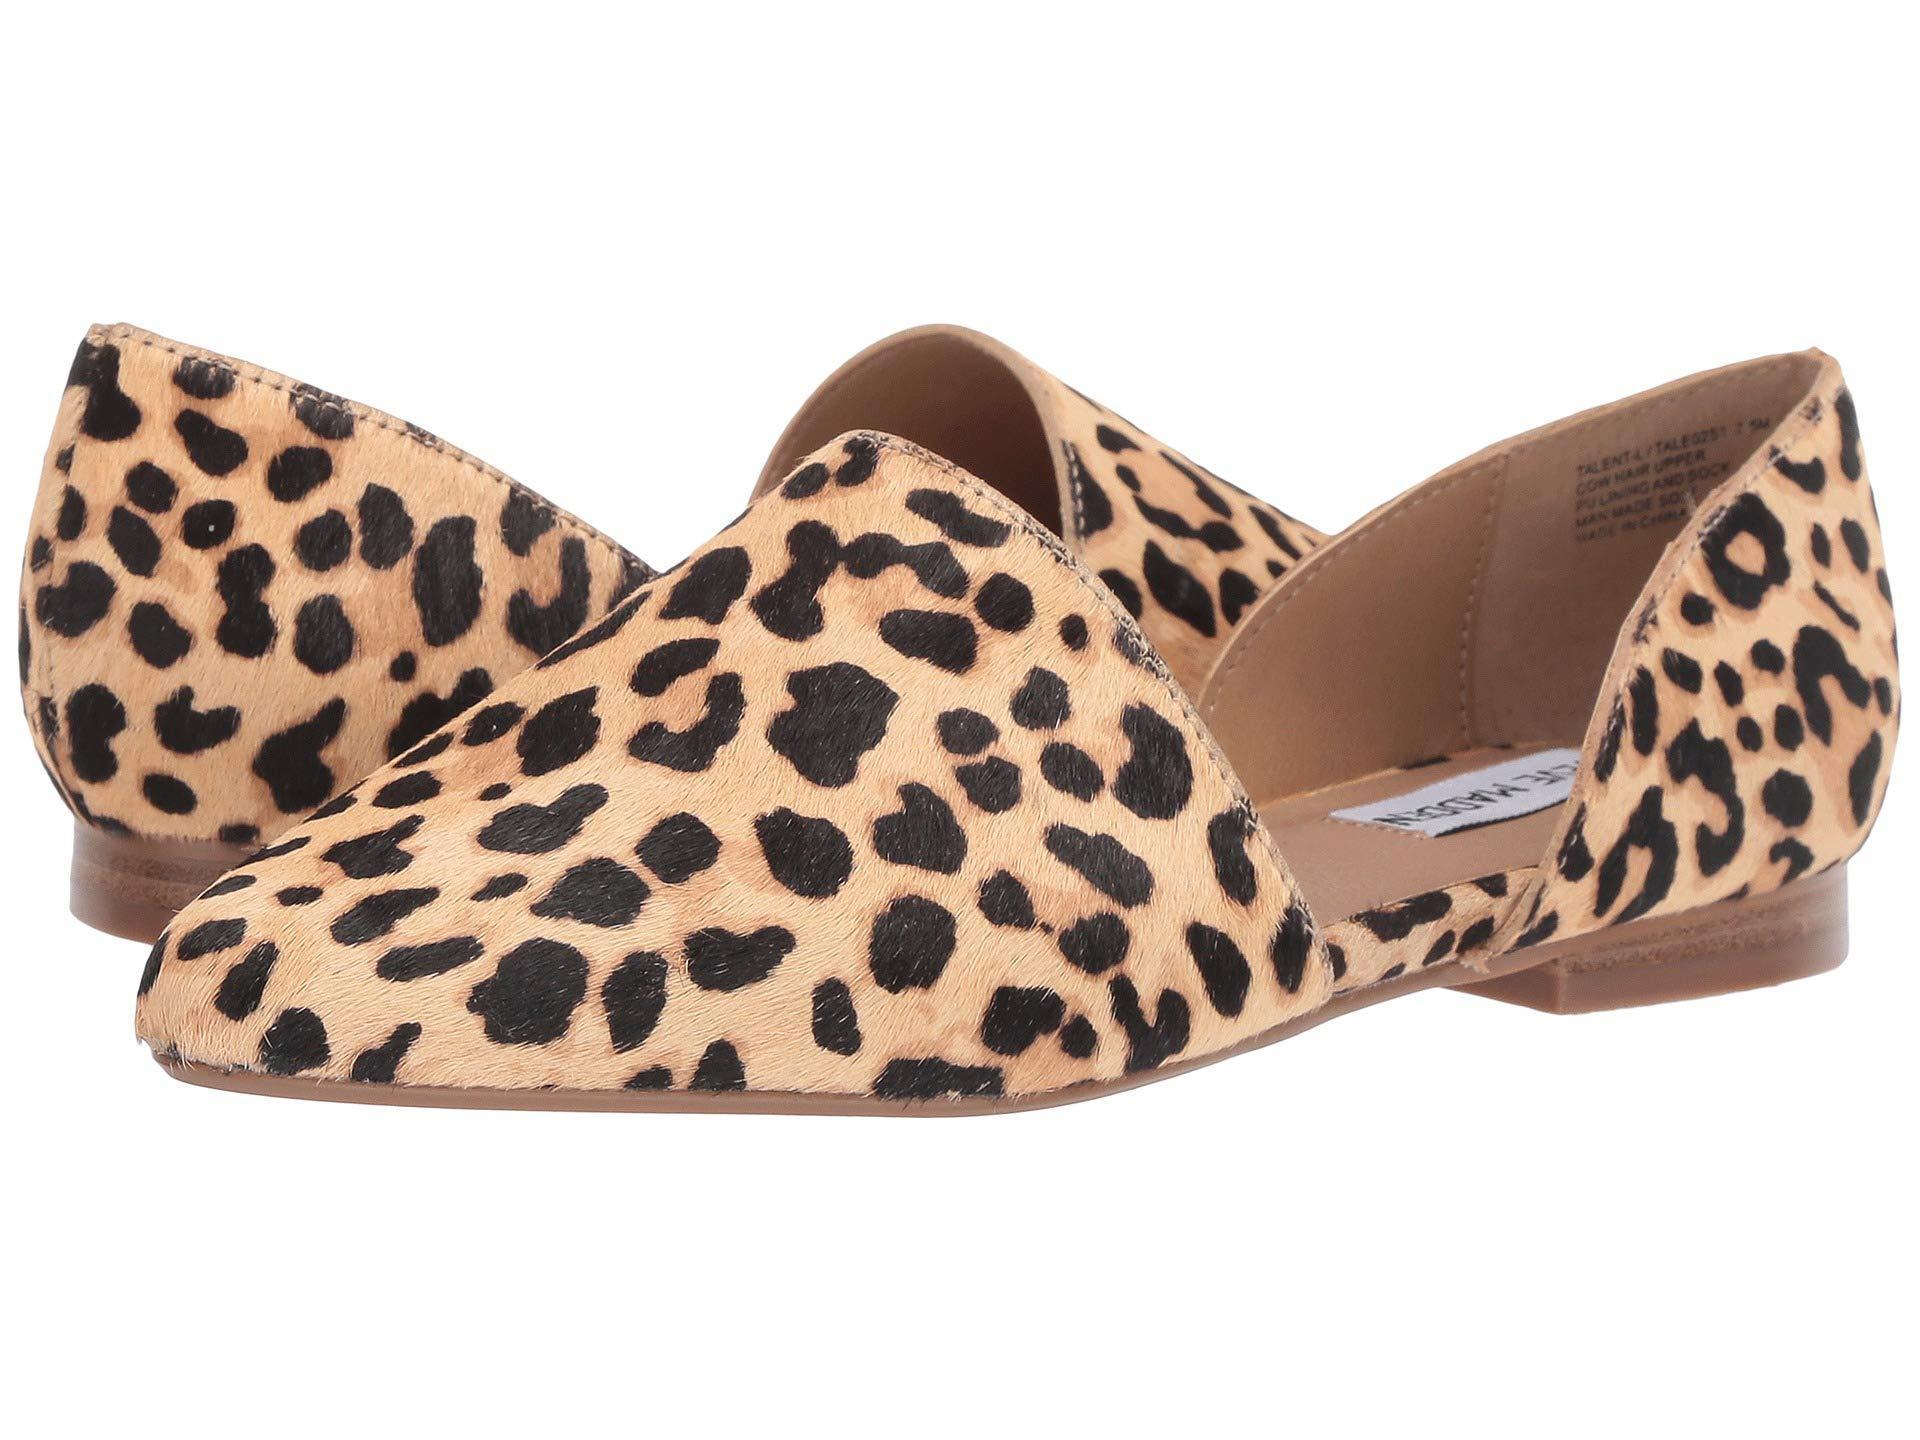 05c86053638 Lyst - Steve Madden Talent-l Flat (leopard) Women s Shoes